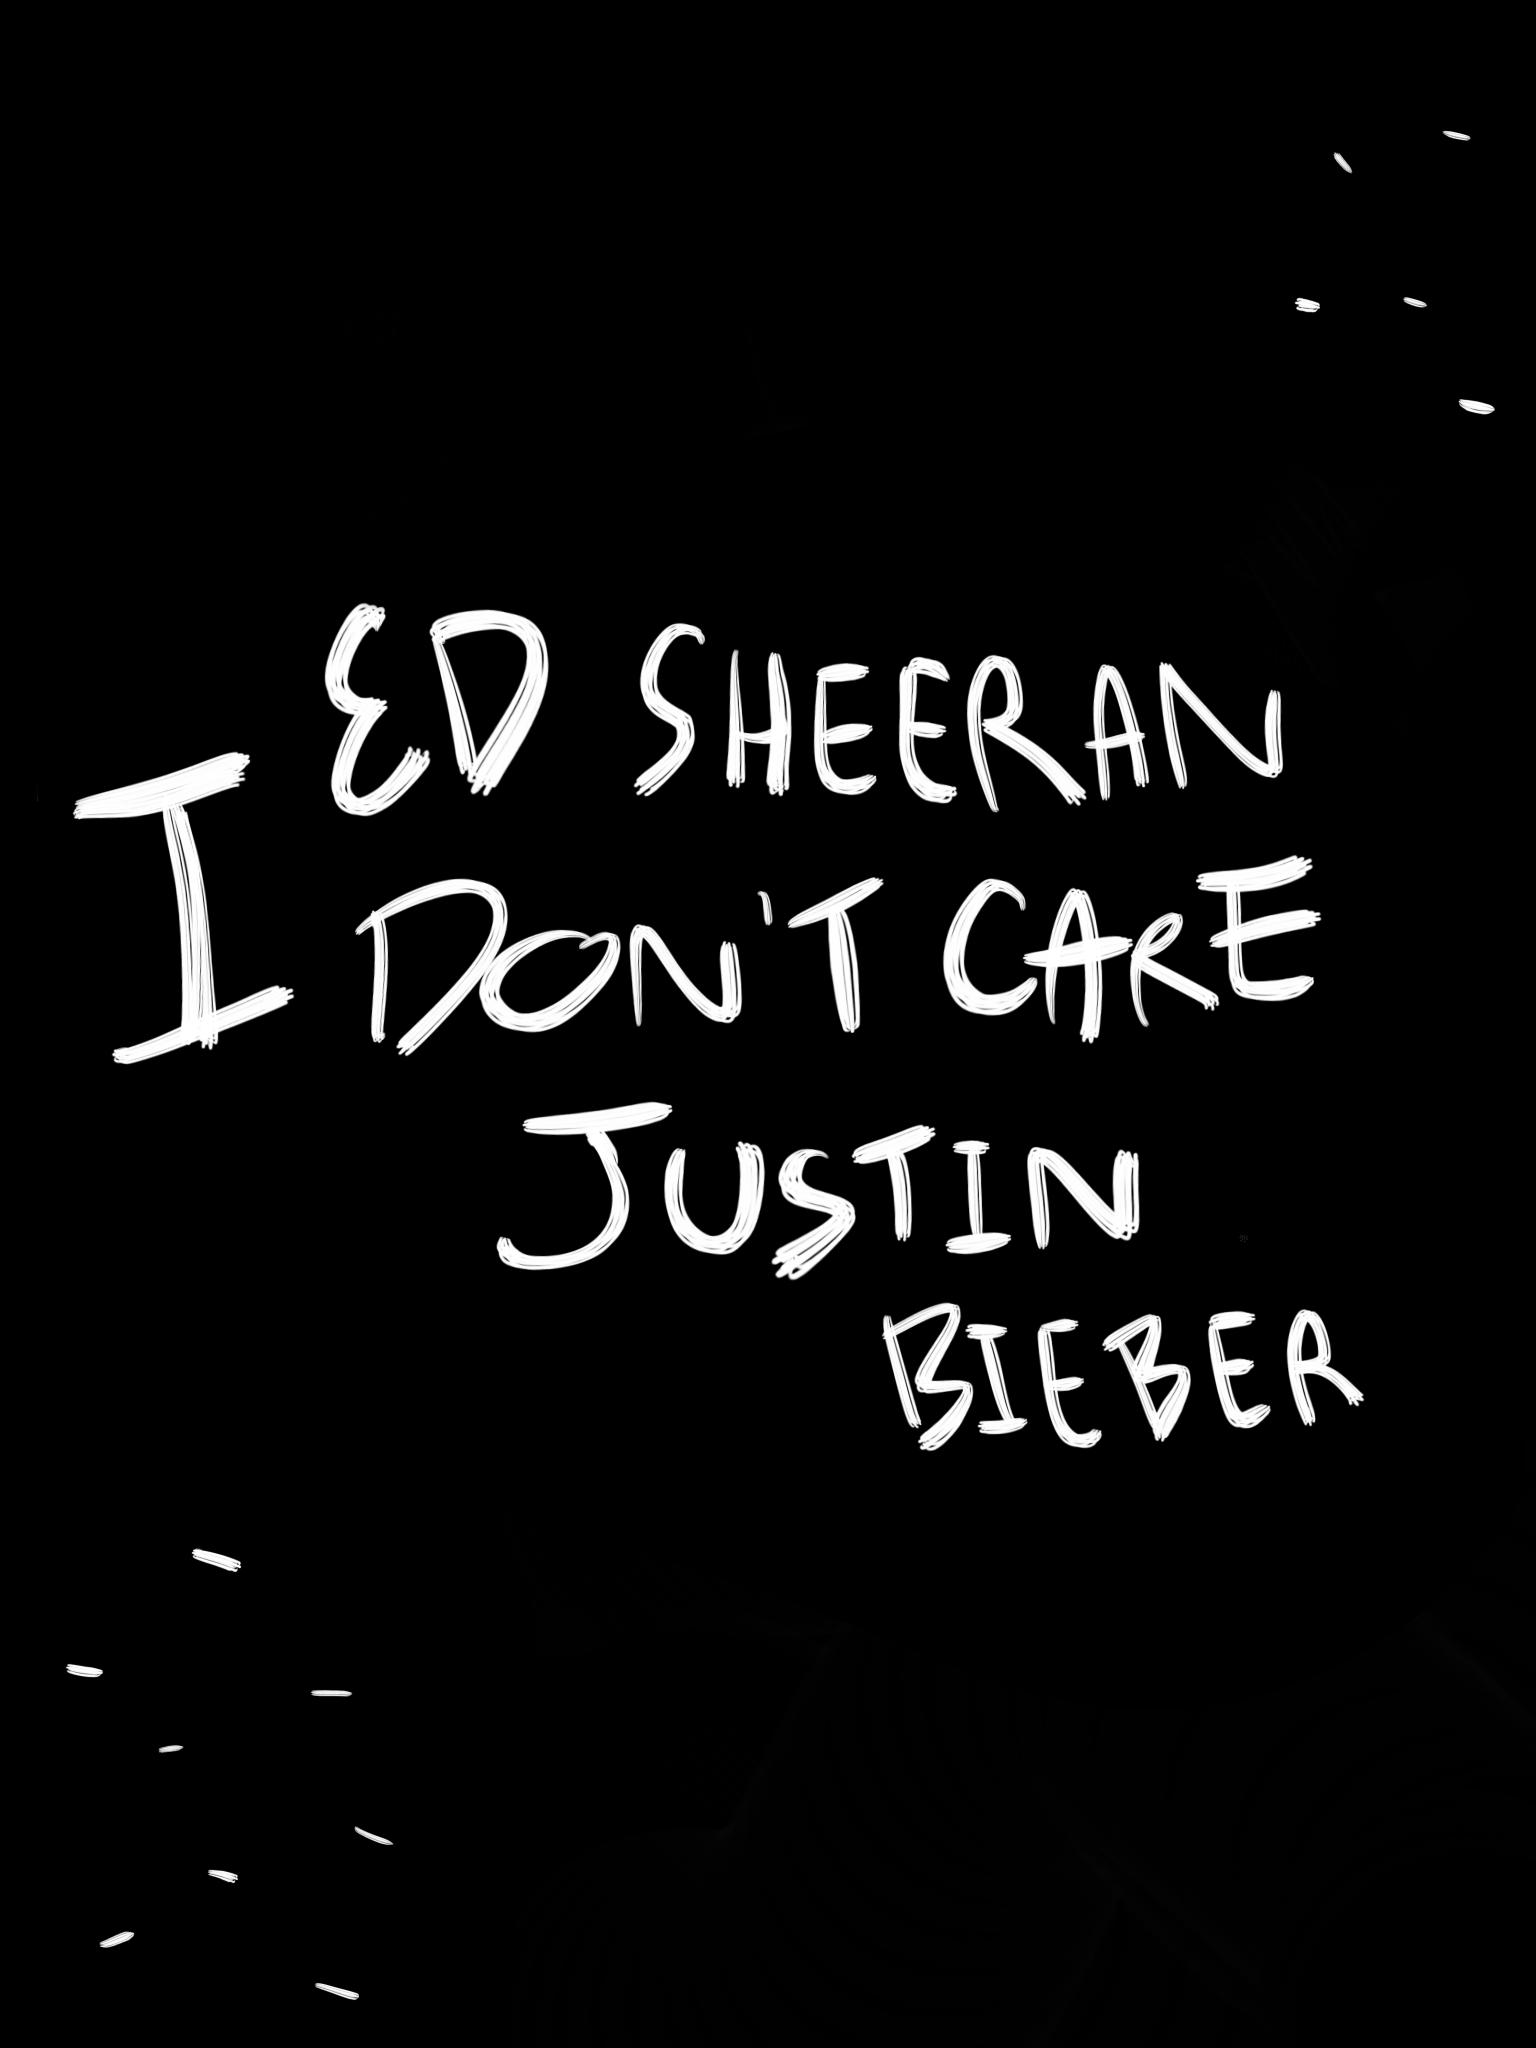 Wallpaper Ed Sheeran Justin Bieber I Don T Care Idc Me Too Lyrics Ed Sheeran Ed Sheeran Justin Bieber